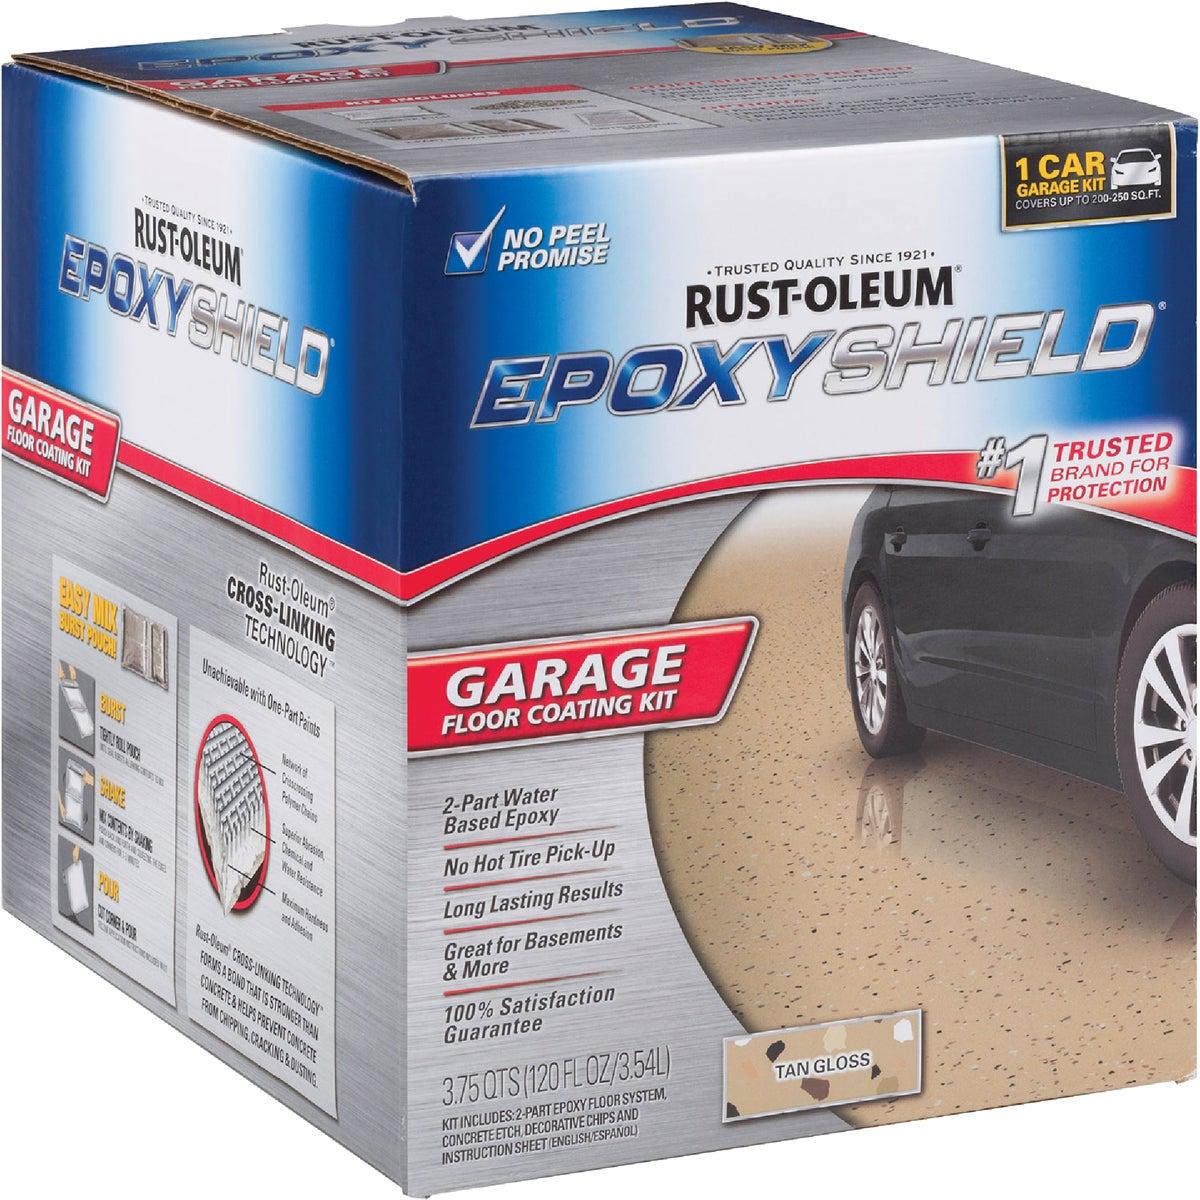 Rust-Oleum 251966 Garage Floor Kit, Tan Gloss